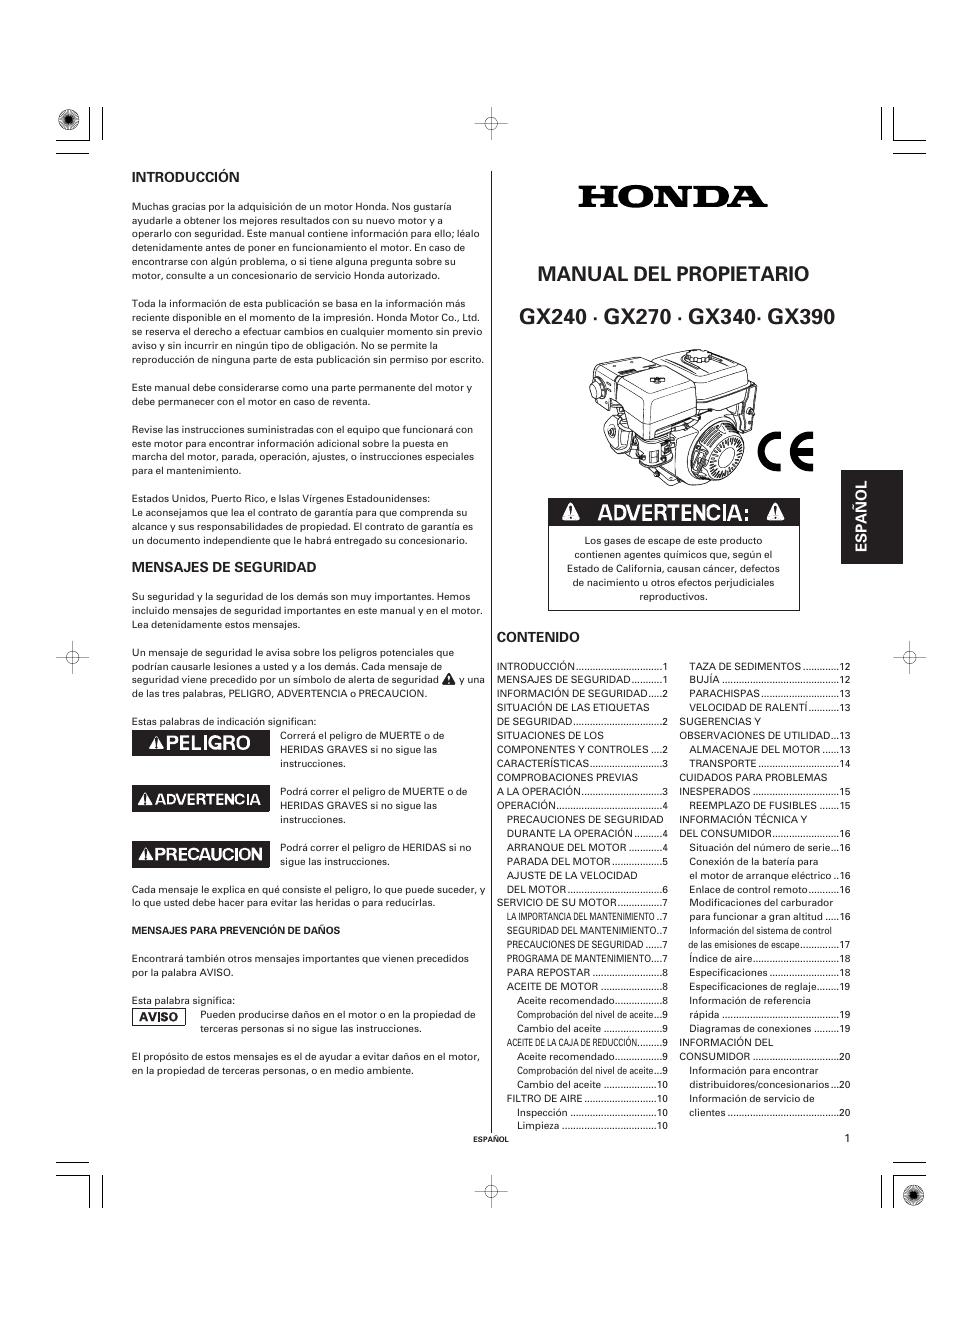 espa ol manual del propietario honda gx270 user manual page 41 60 rh manualsdir com